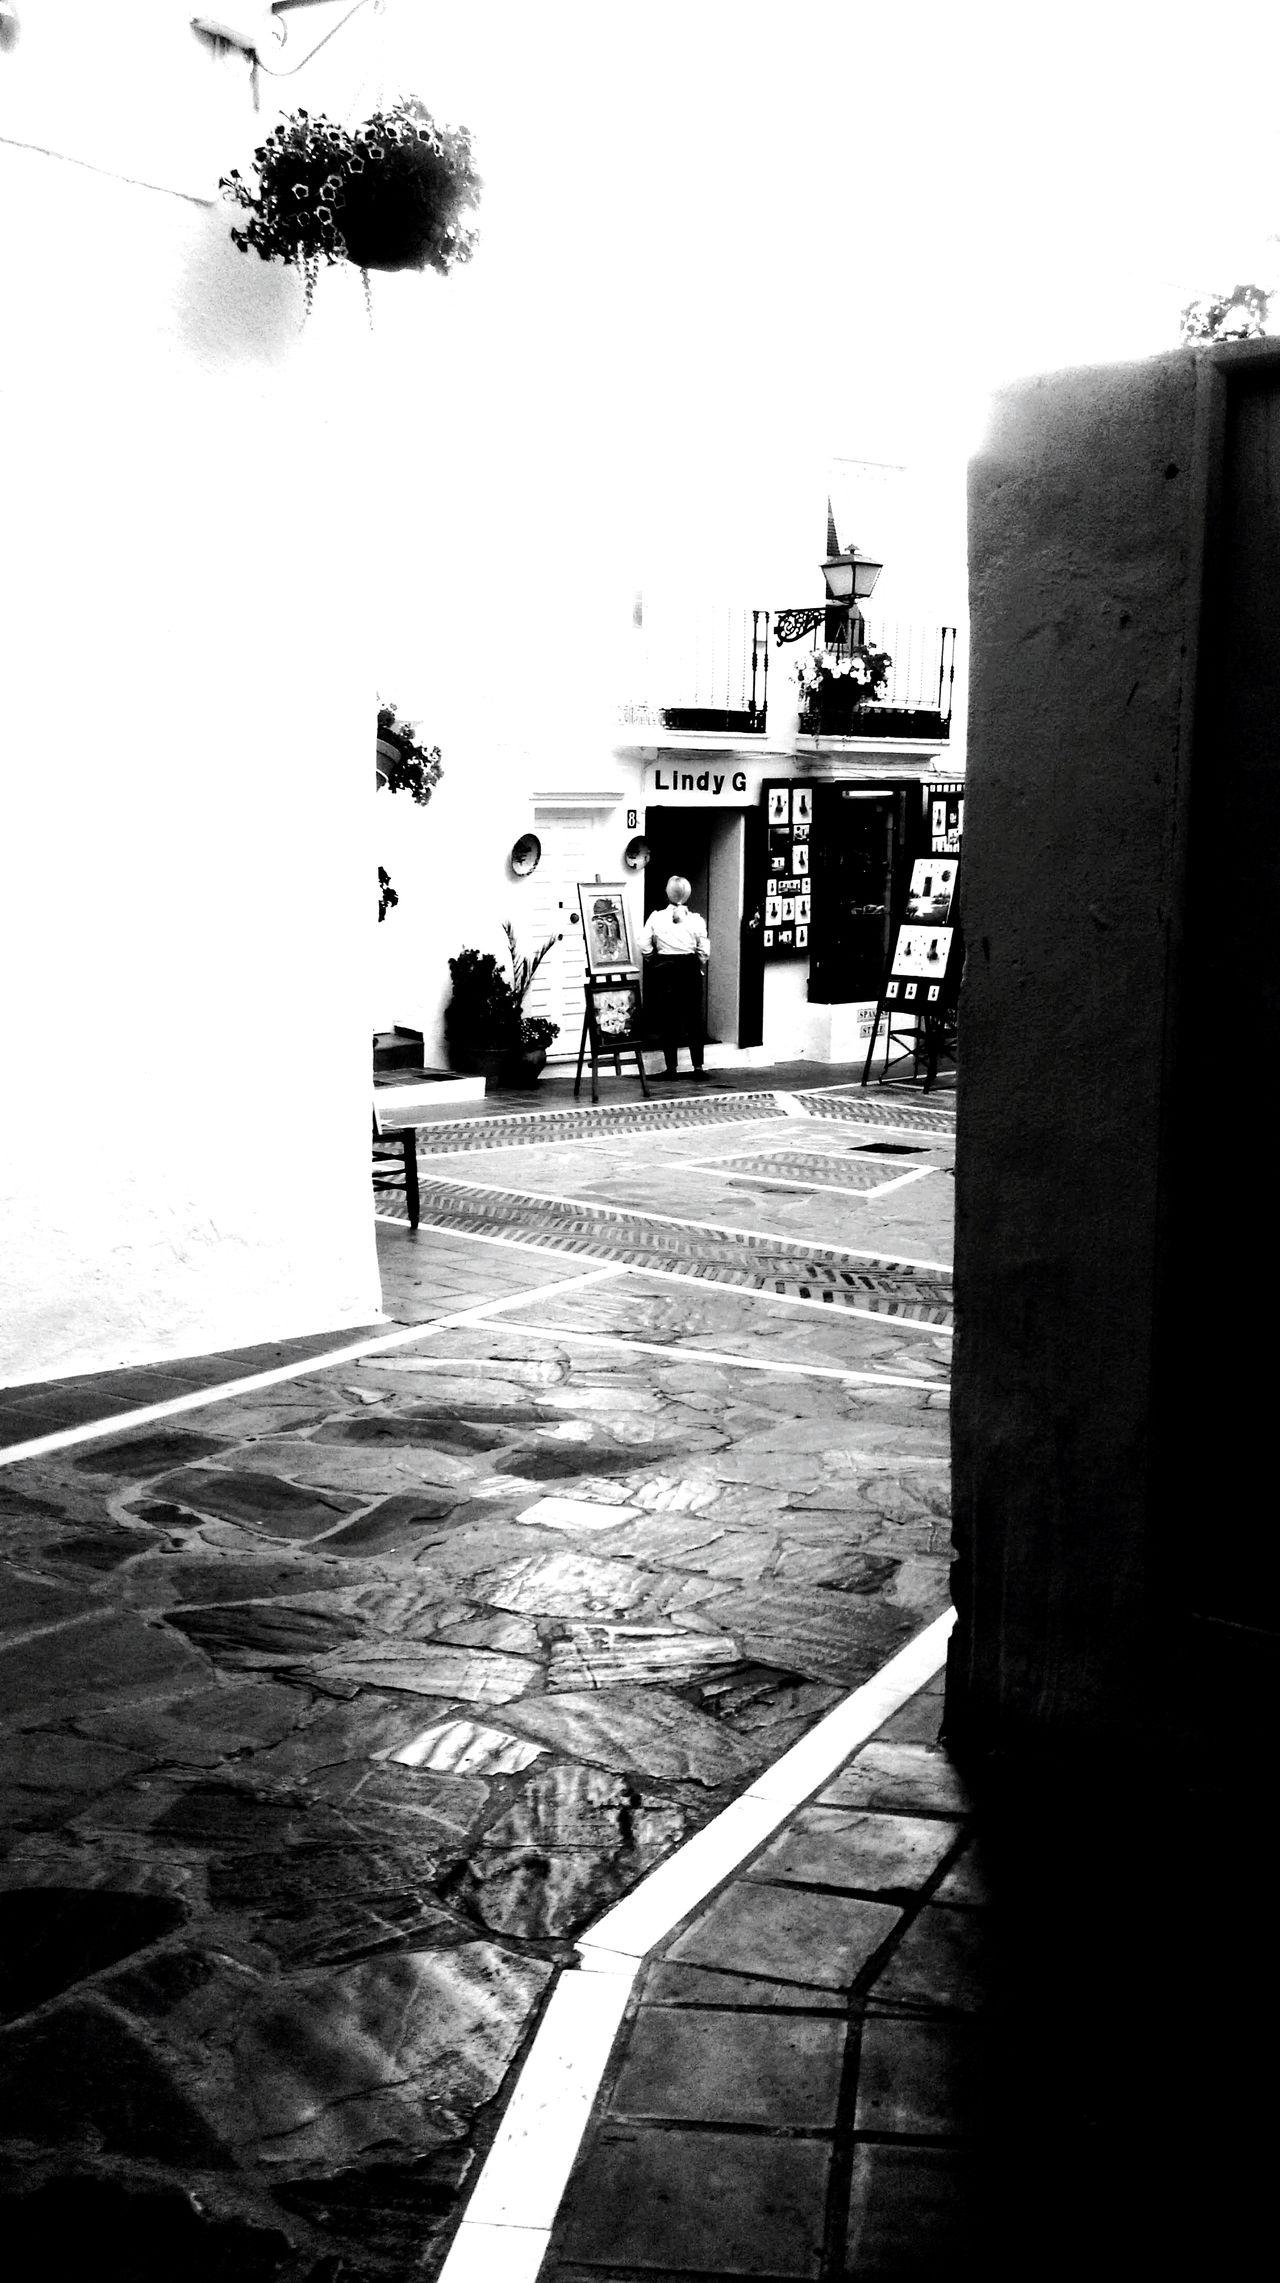 Welcome To Black Architecture Outdoors MarbellaOldTown Sea Beach EyeEmNewHere Mediterranean Marbella EyeEmNewHere Vacations